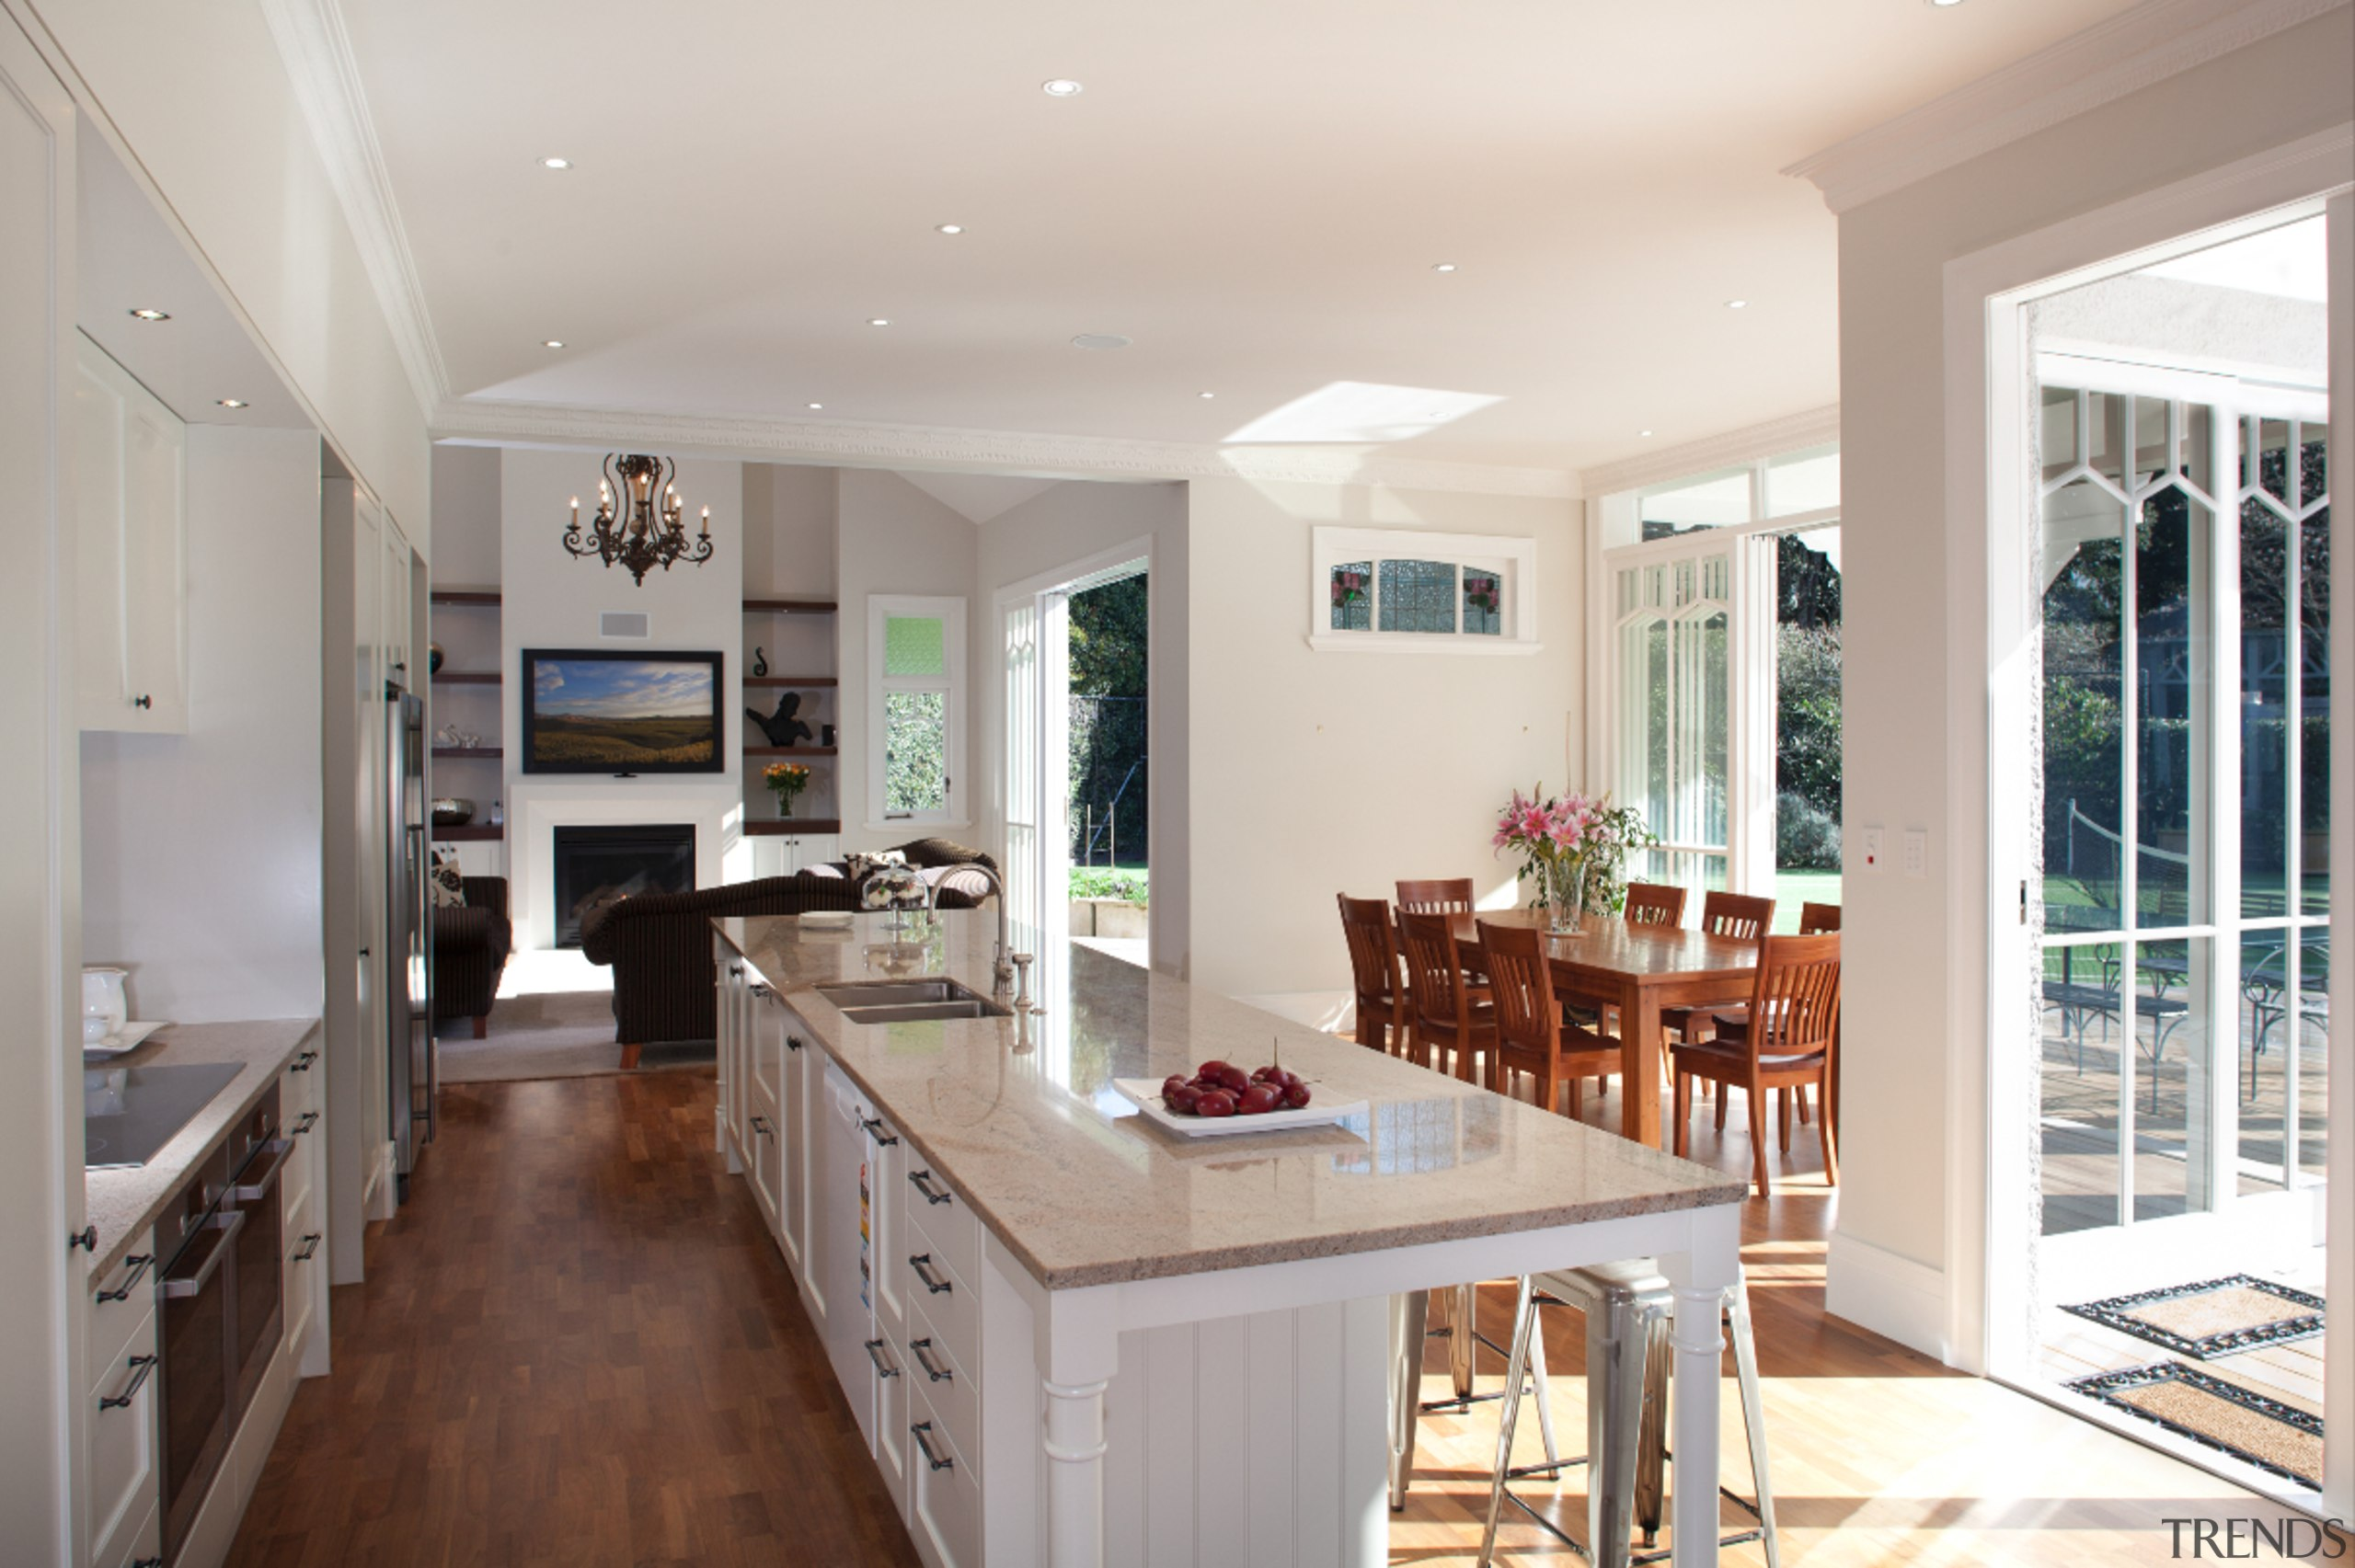 Epsom - countertop | home | interior design countertop, home, interior design, kitchen, living room, real estate, room, window, gray